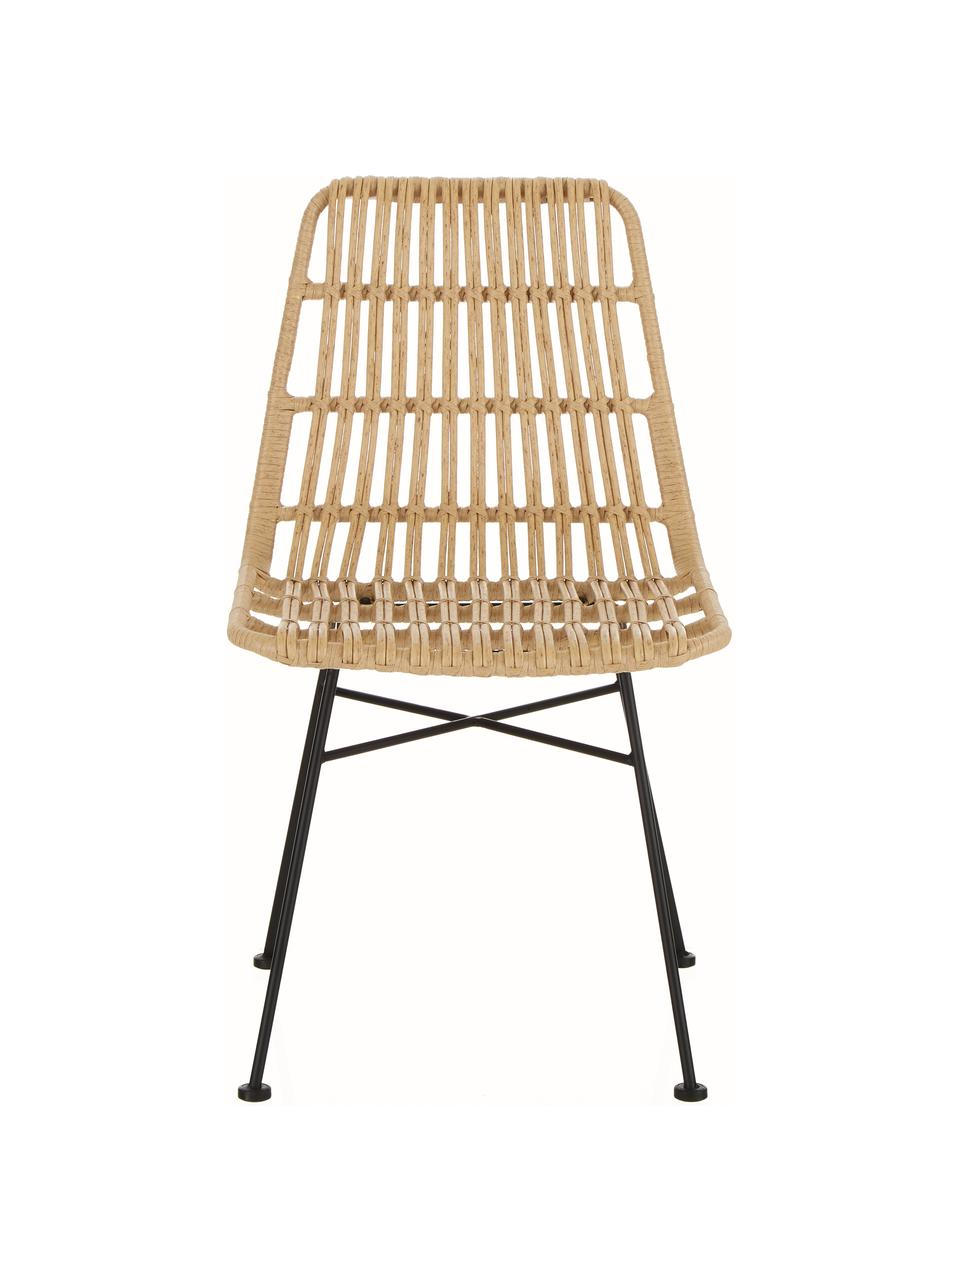 Polyrattan-Stühle Costa, 2 Stück, Sitzfläche: Polyethylen-Geflecht, Gestell: Metall, pulverbeschichtet, Hellbraun, Schwarz, B 47 x T 61 cm